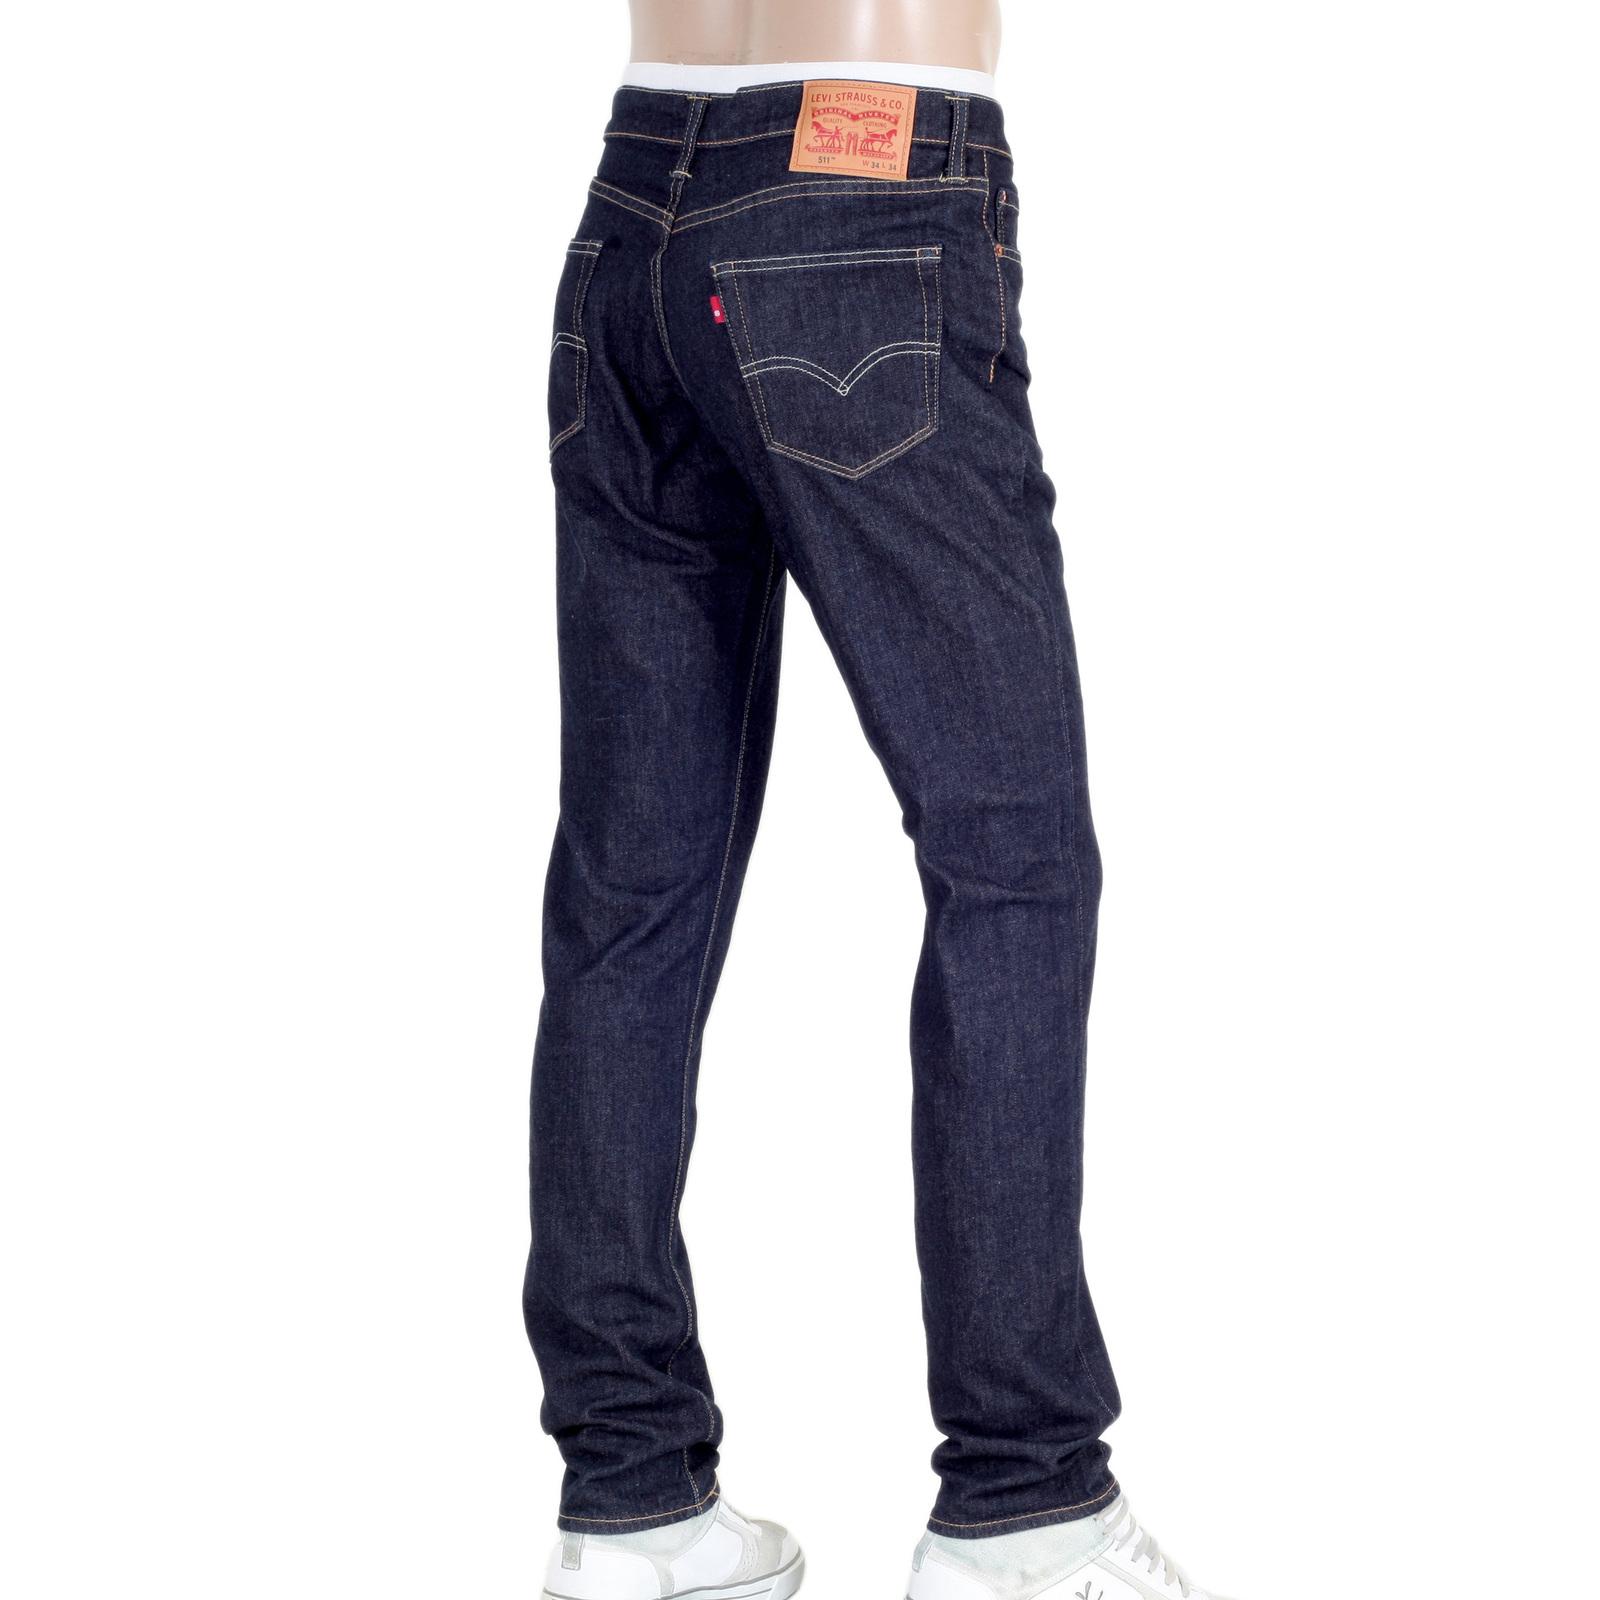 404bae8419b Mens Dark Blue Levis 511 Slim Fit Jeans with Low Waist